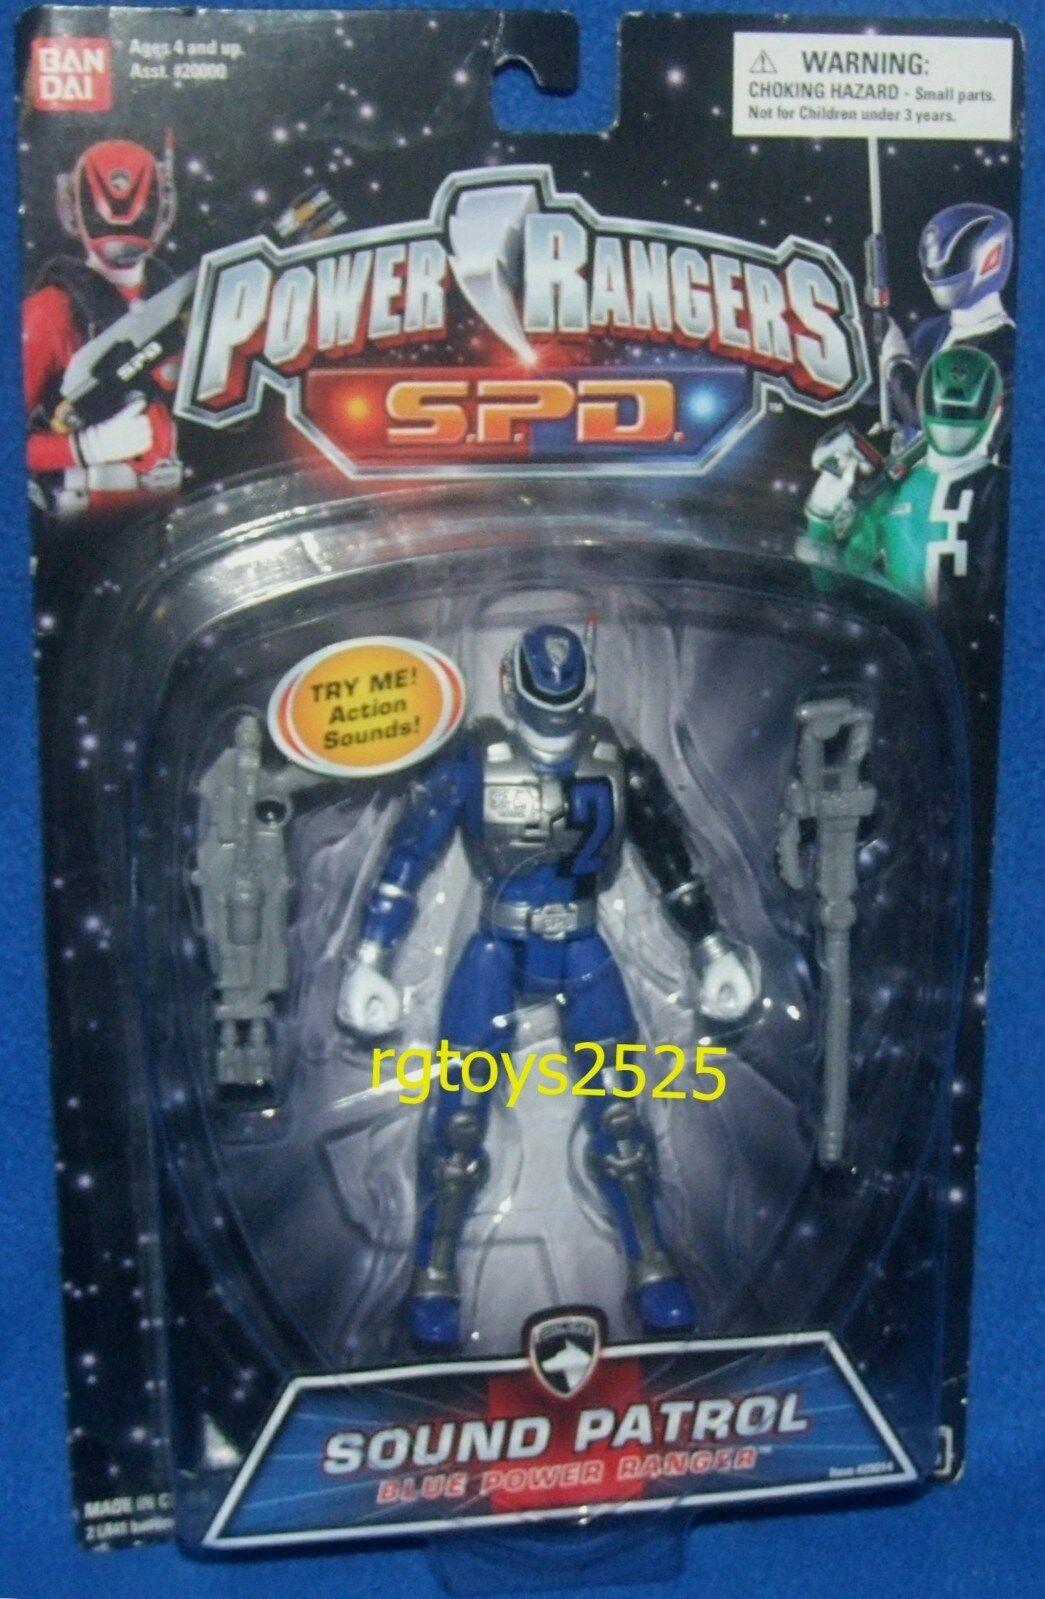 Power Rangers SPD Sound Patrol bluee bluee bluee 5  Ranger New Factory Sealed 2004 b0698f